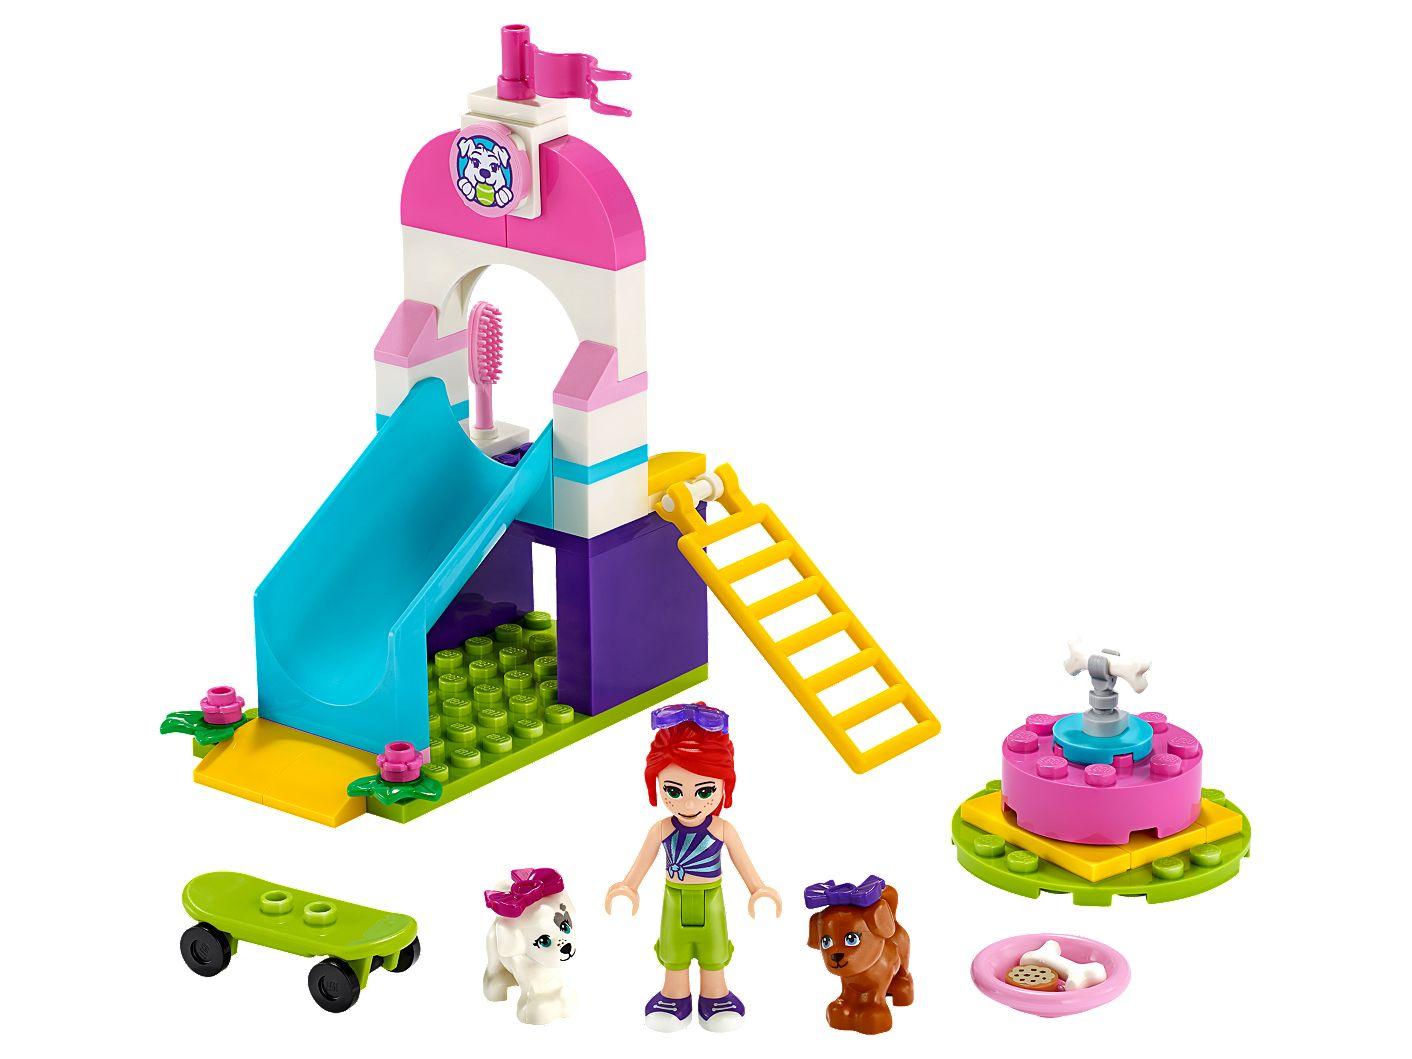 LEGO Friends - Welpenspielplatz (41396)